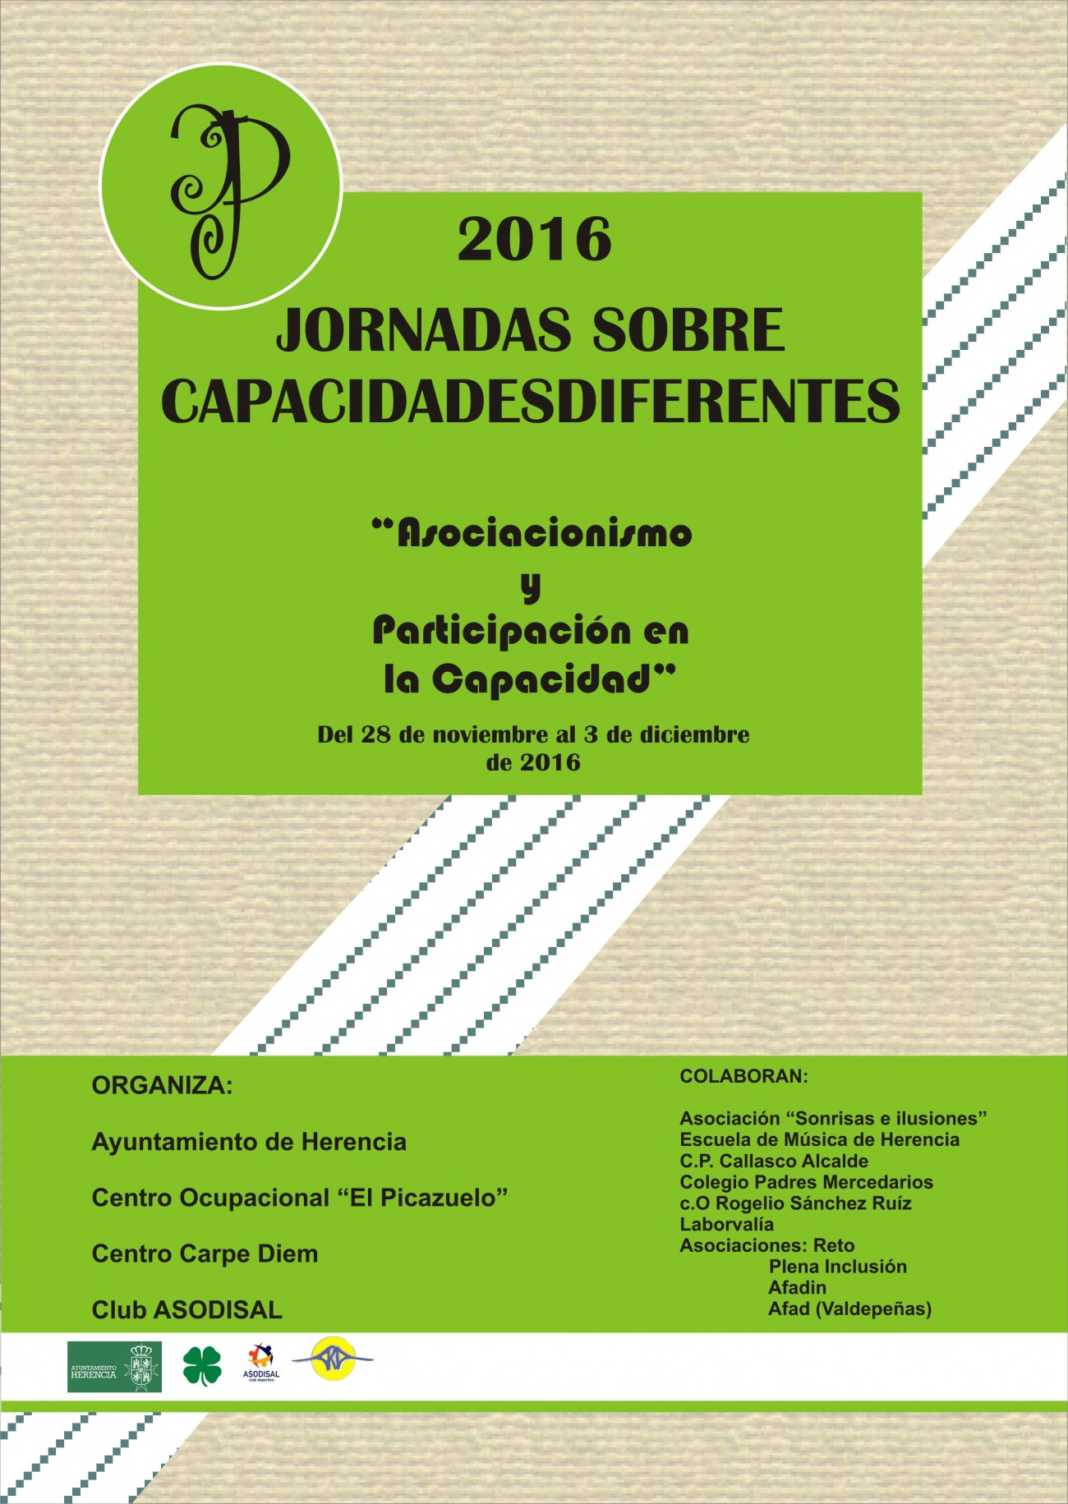 jornadas sobre capacidades diferentes en herencia 1068x1504 - Jornadas sobre capacidades diferentes 2016 en Herencia